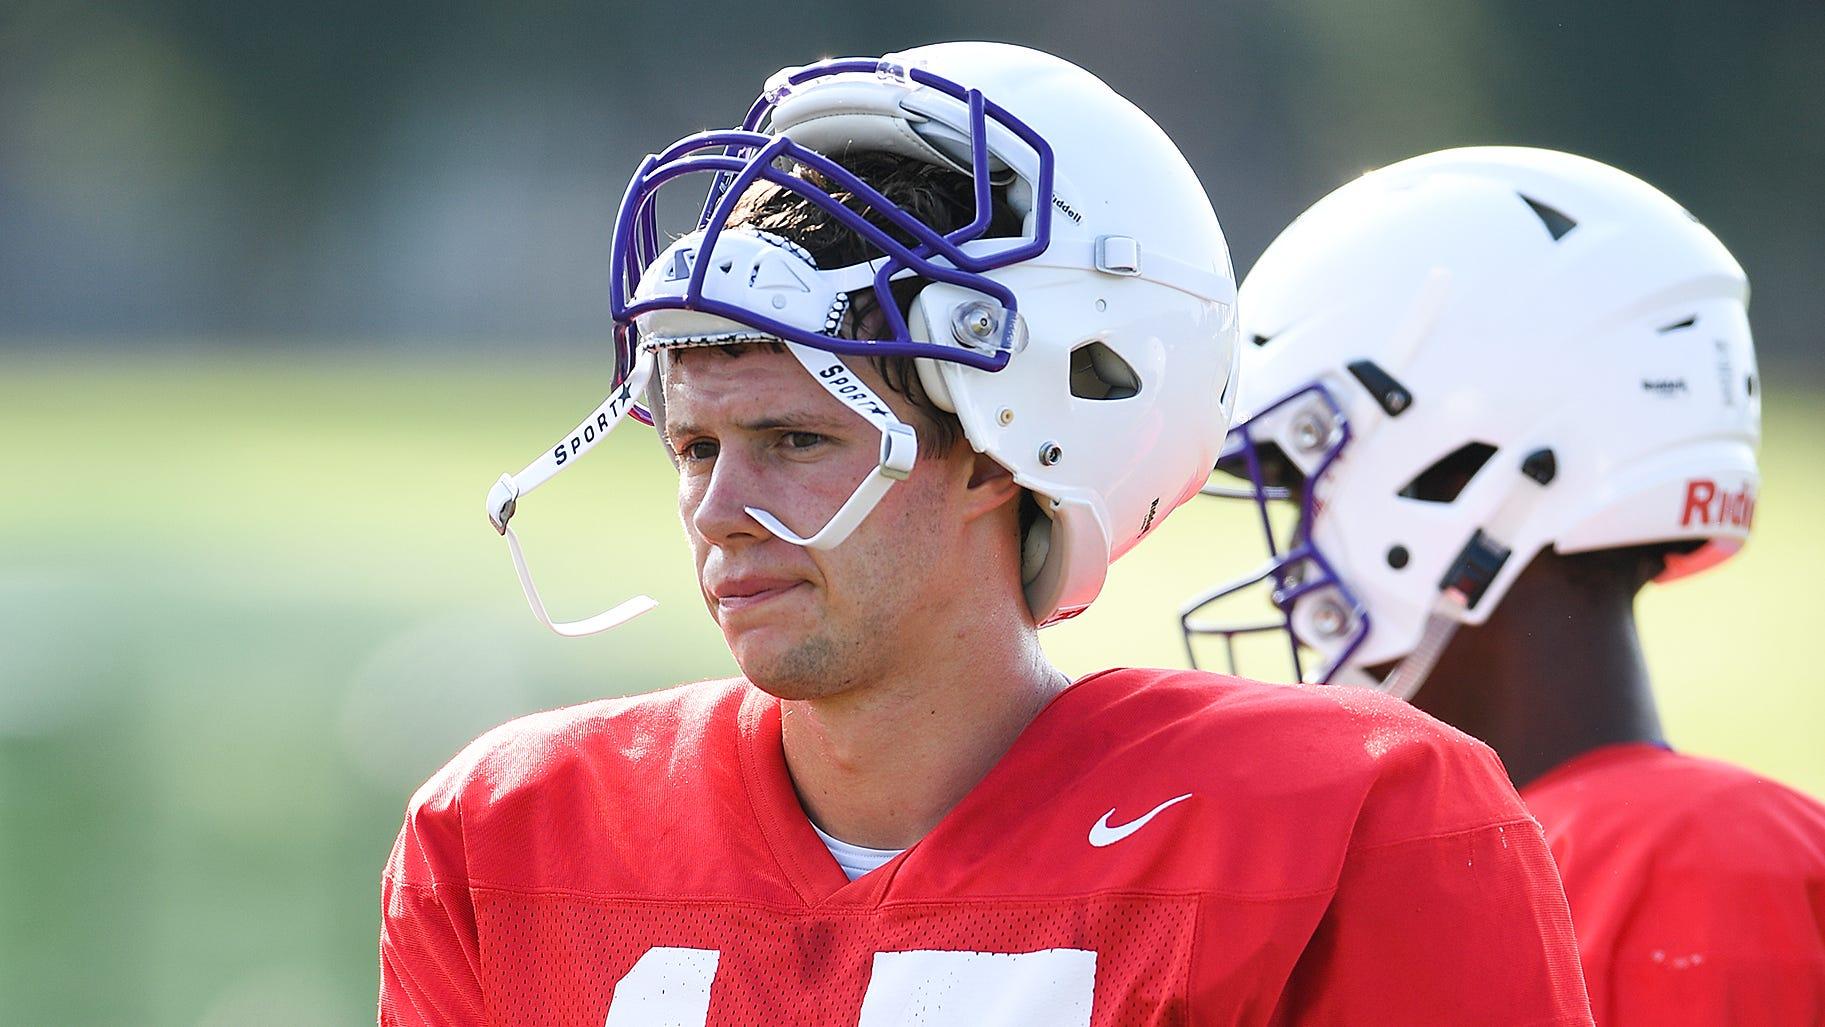 Clemson student Harris Roberts could start at quarterback for Furman